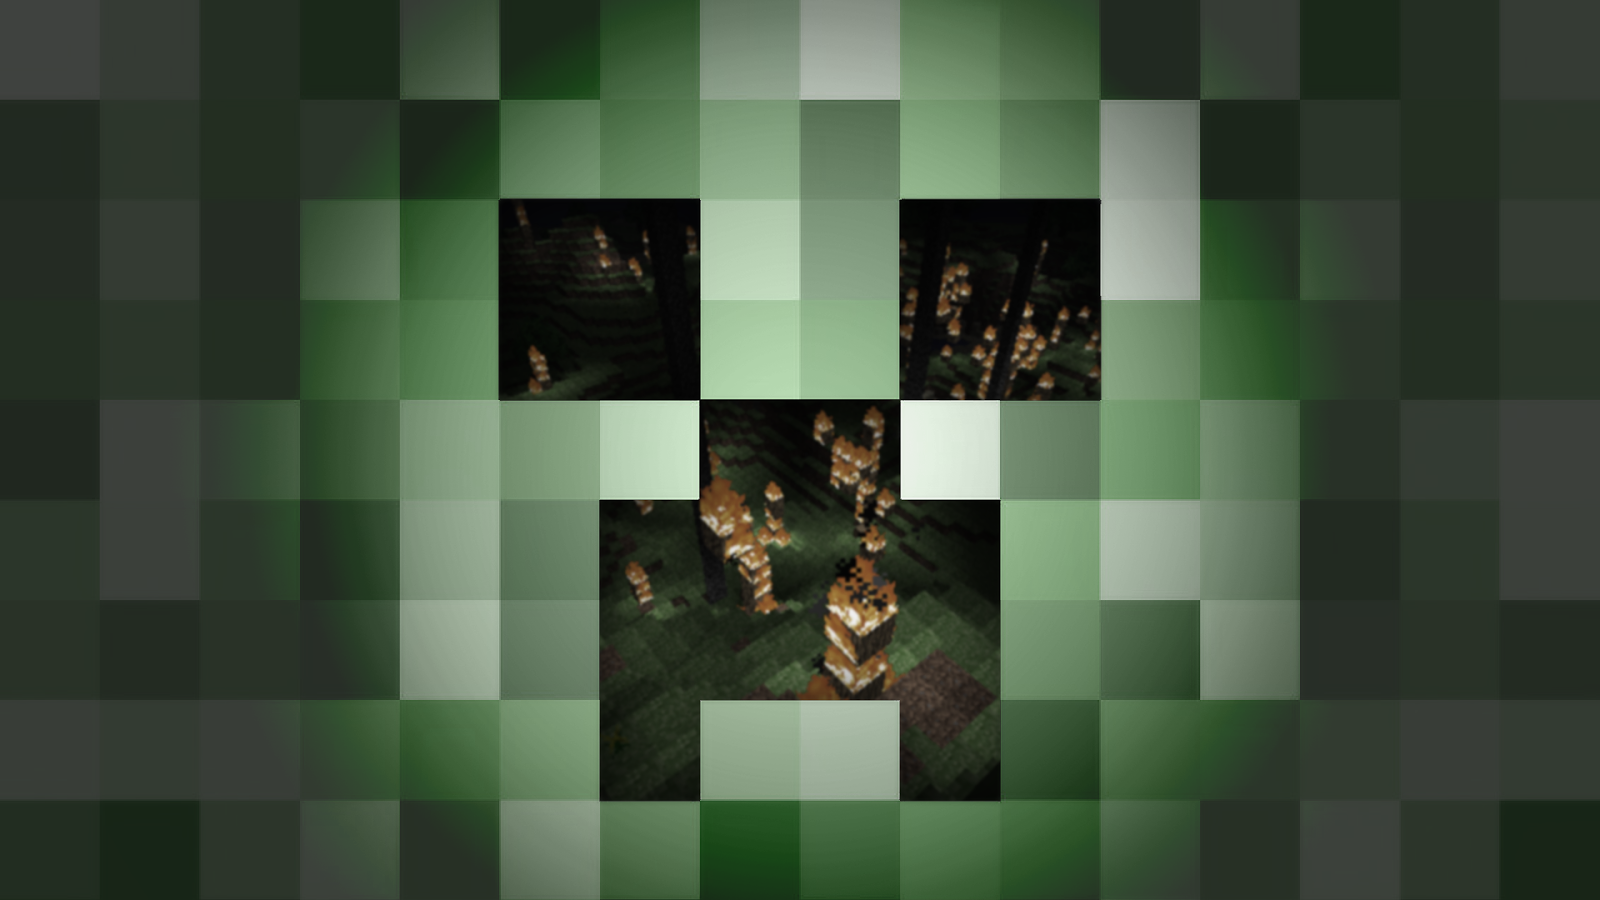 Cool Minecraft Wallpapers Hd Most Recent Minecraft Hd 1080p Hd Wallpaper Backgrounds